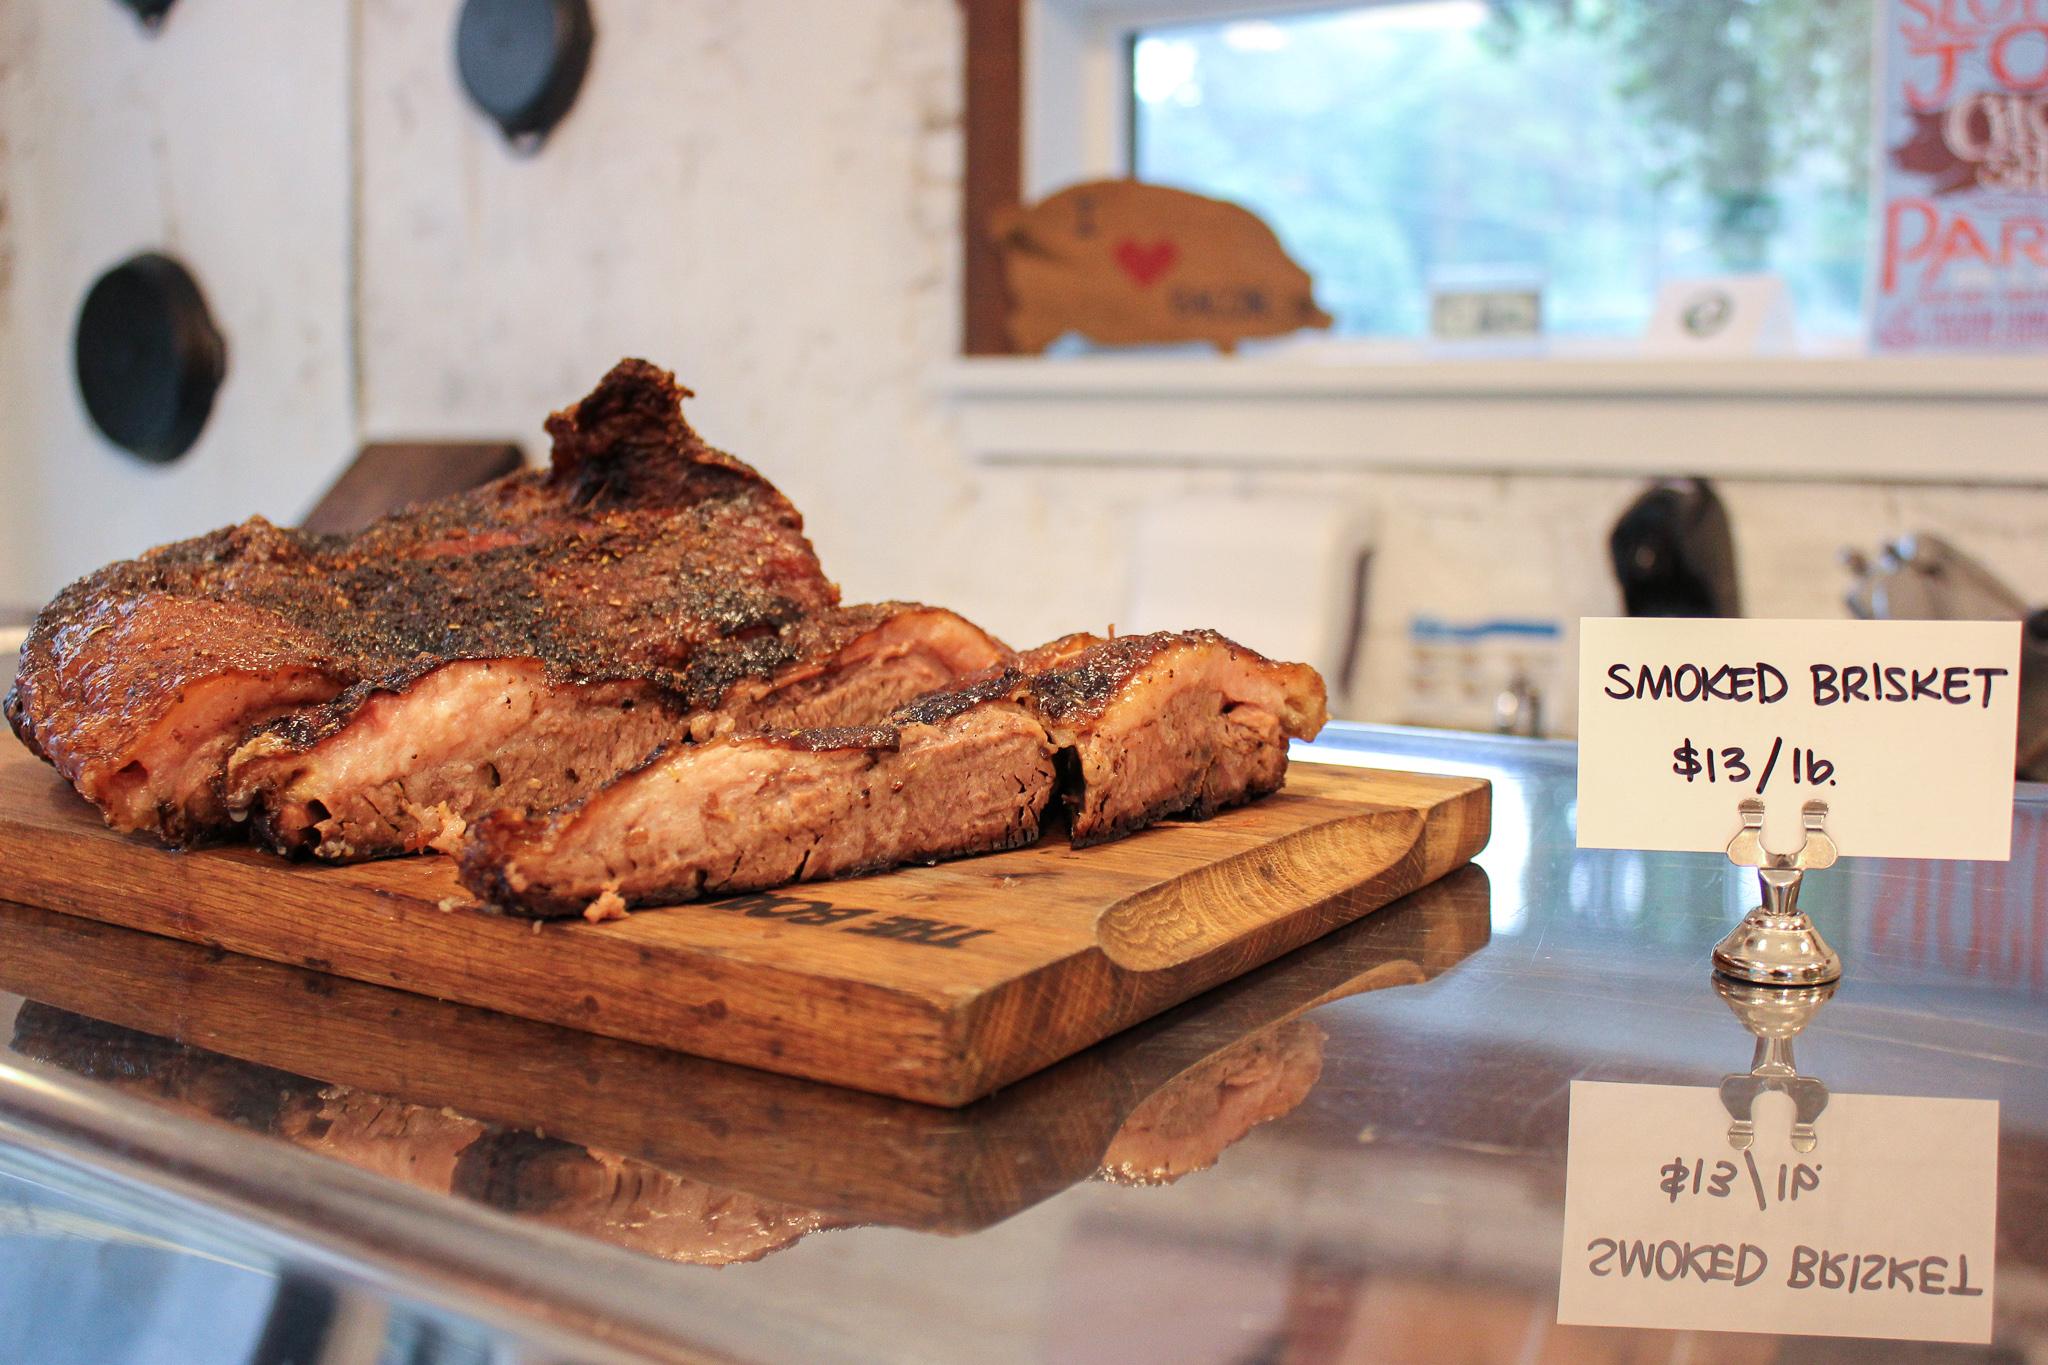 Smoked brisket made on the premises at Chop Shop (c) Anna Lanfreschi